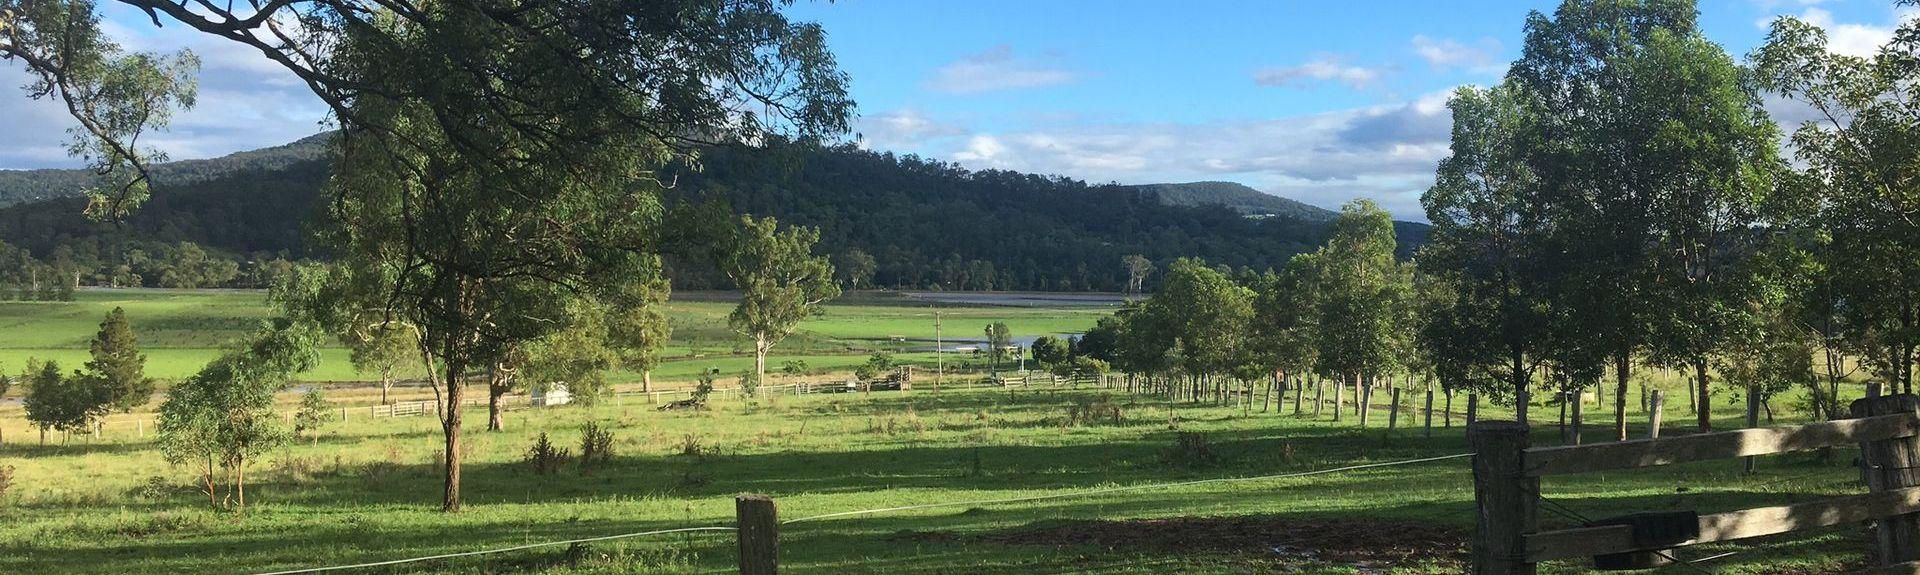 Exploitation viticole et lavandière Kooroomba, Mount Alford, Queensland, Australie